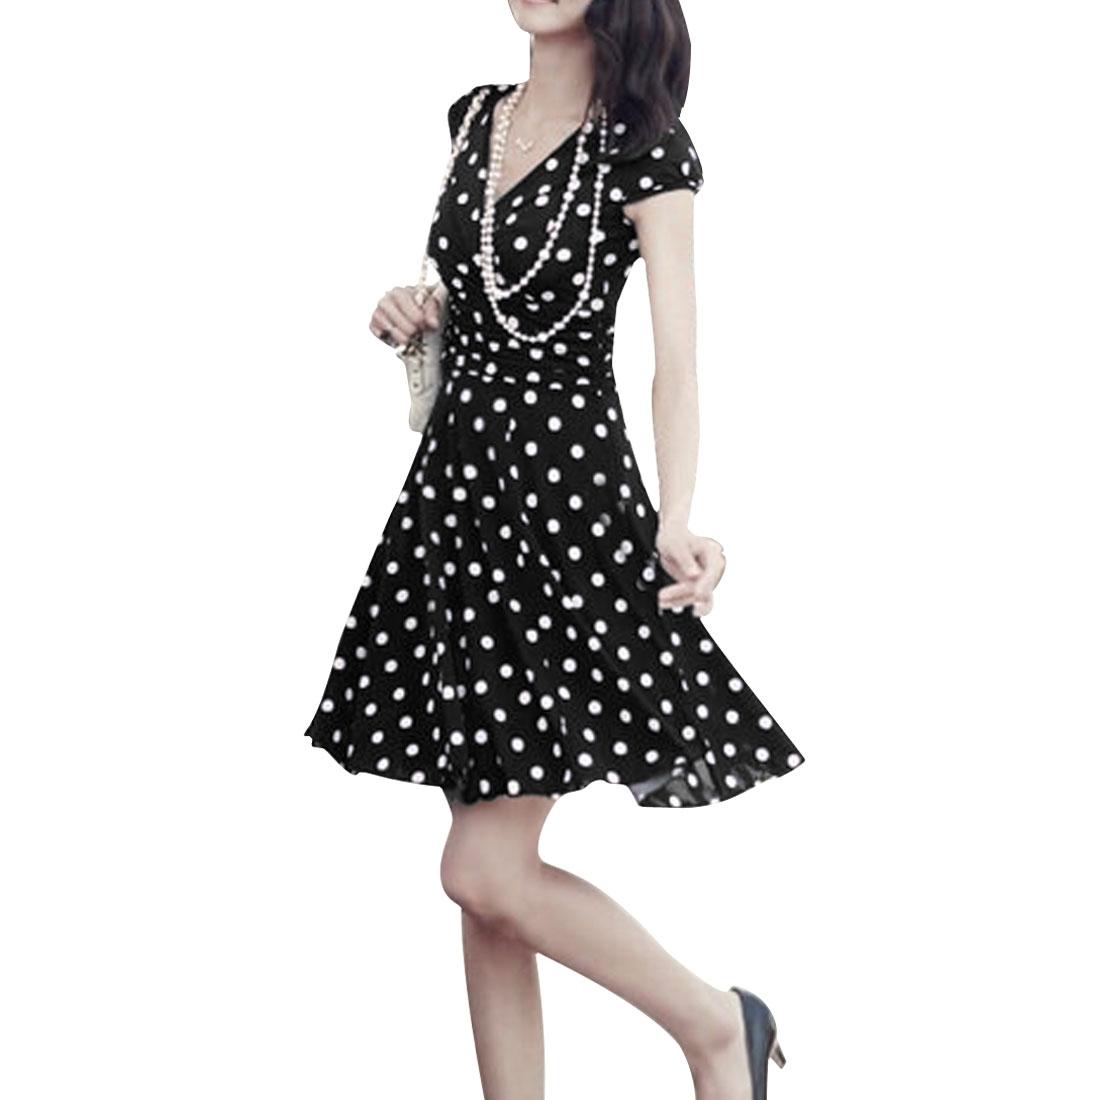 Ladies Dots Prints Above Knee Chiffon Concealed Zipper Side Dress Black XS